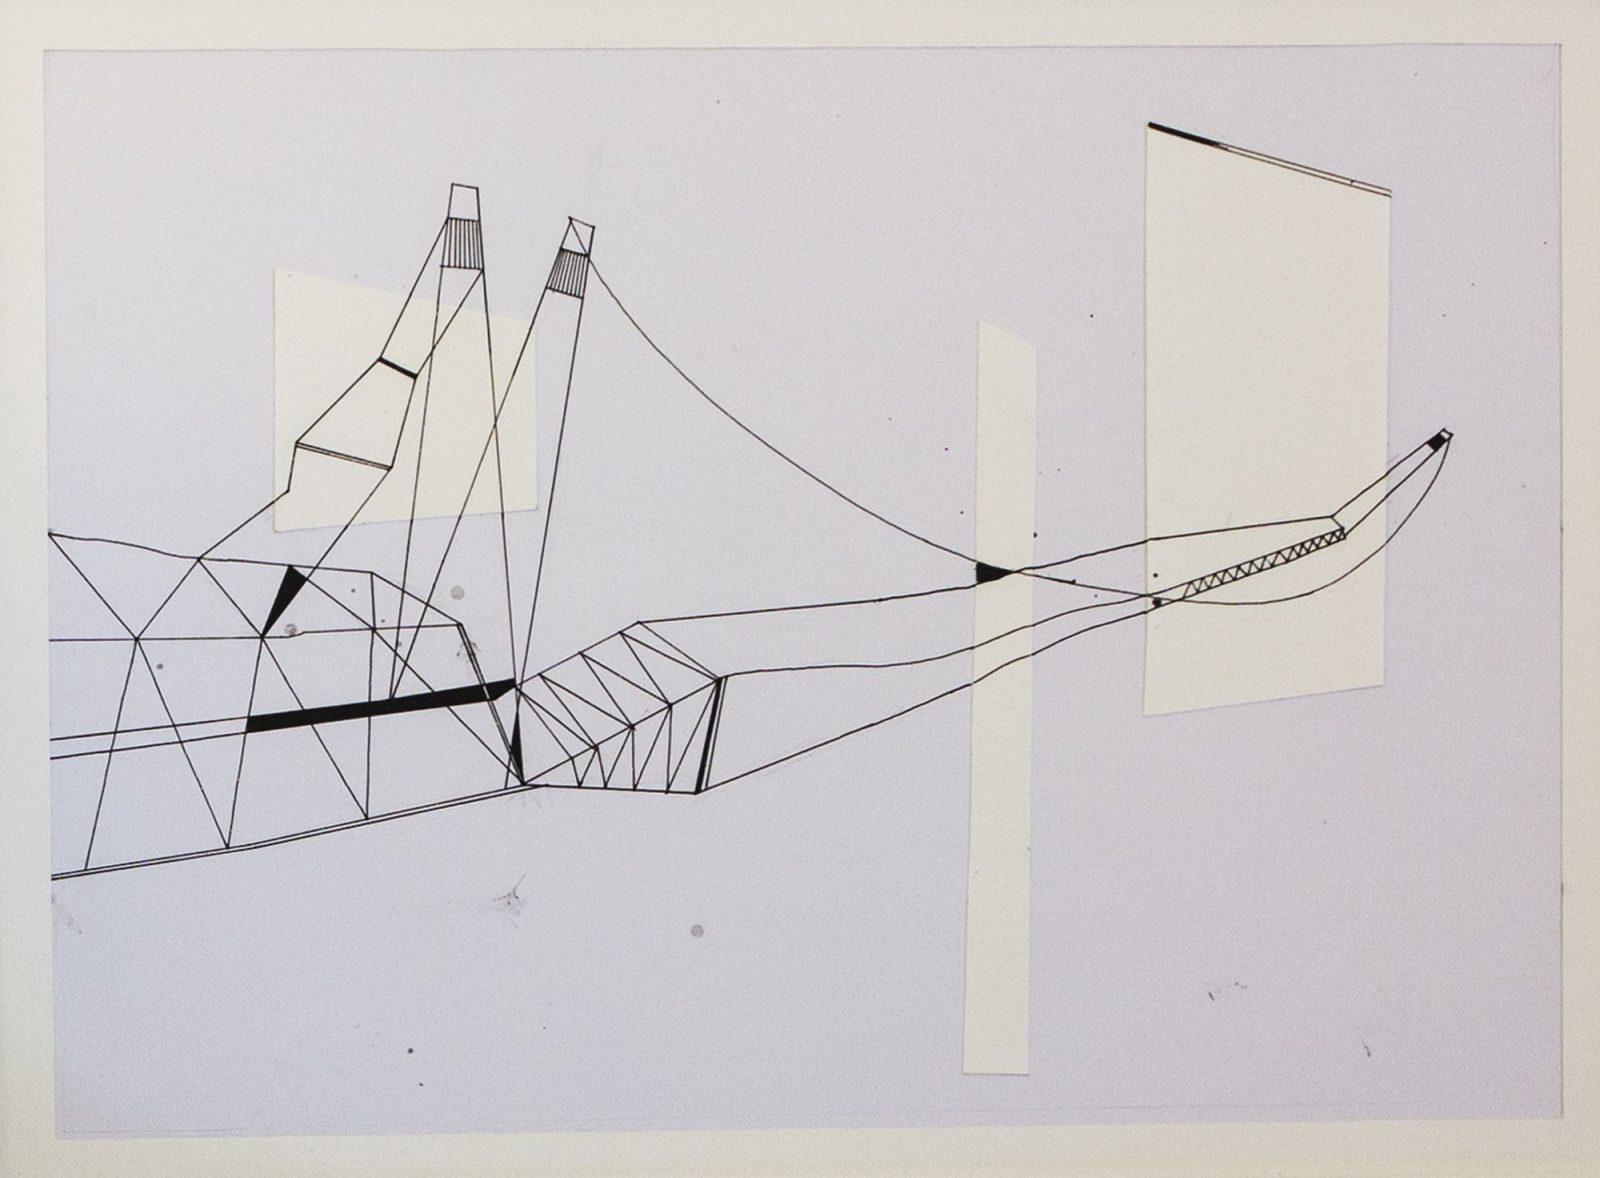 Roland Kazi: The Tilted Crane